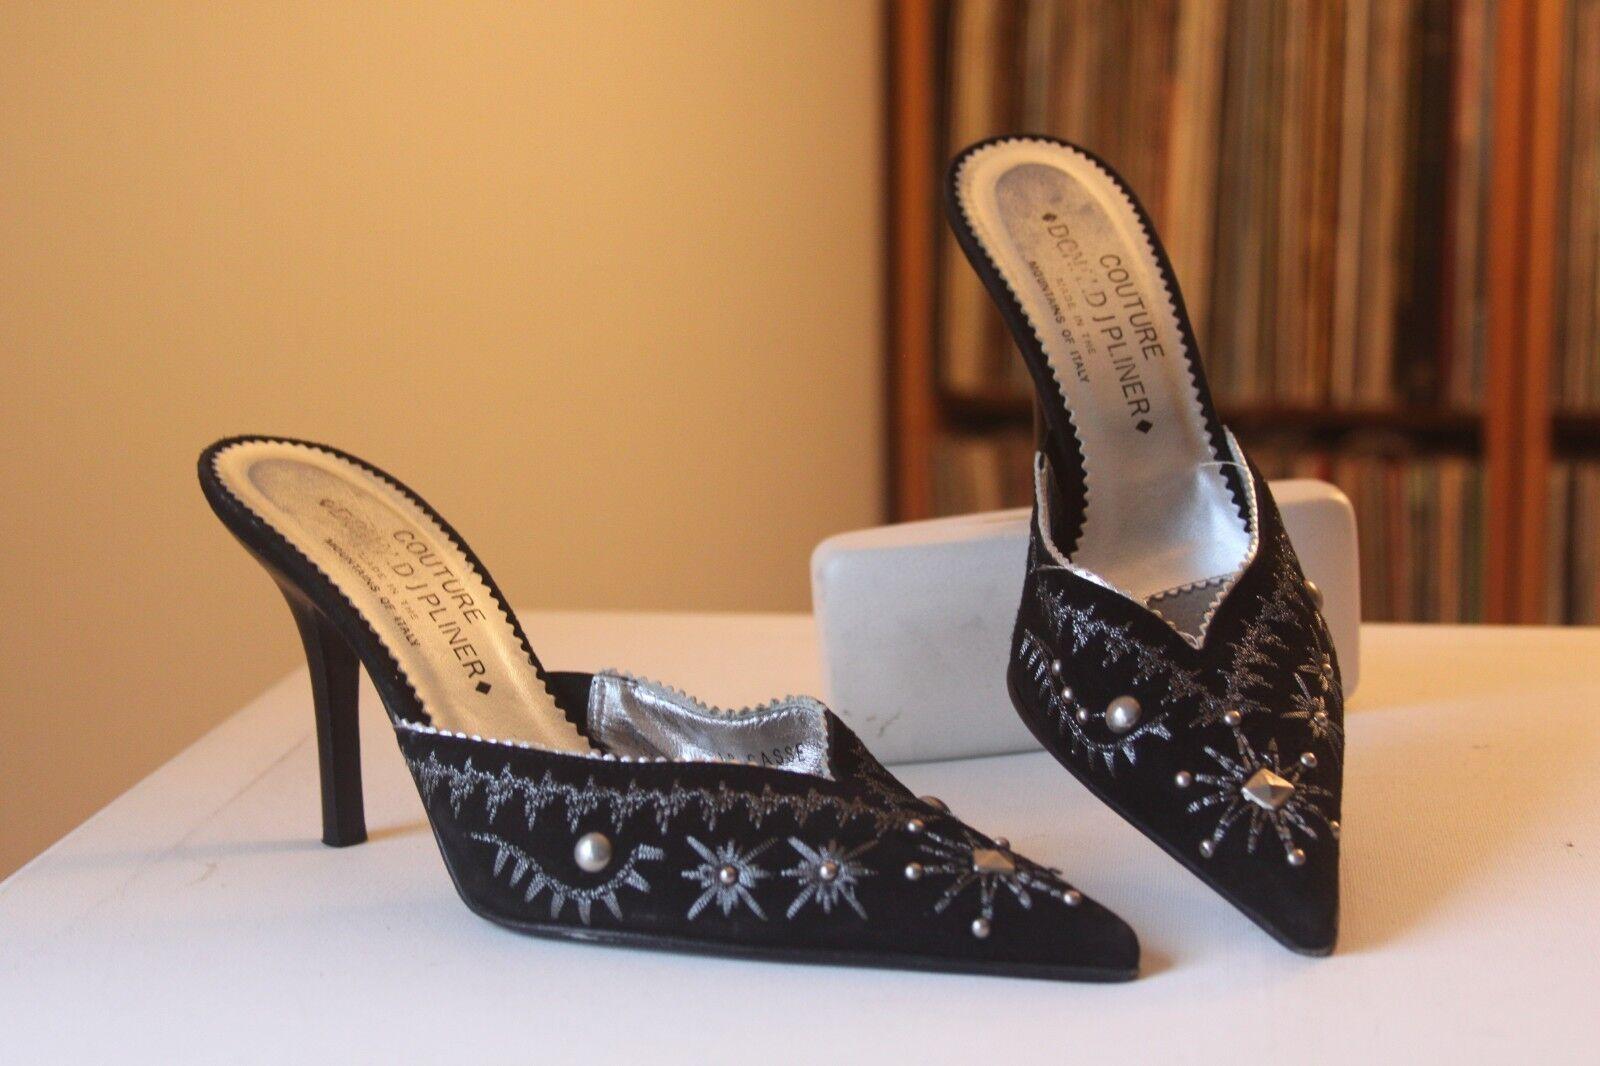 Donald J J J Pliner Couture quiebra Gamuza Negra adornado Tacones De 4 pulgadas tamaño 8.5 M  Compra calidad 100% autentica